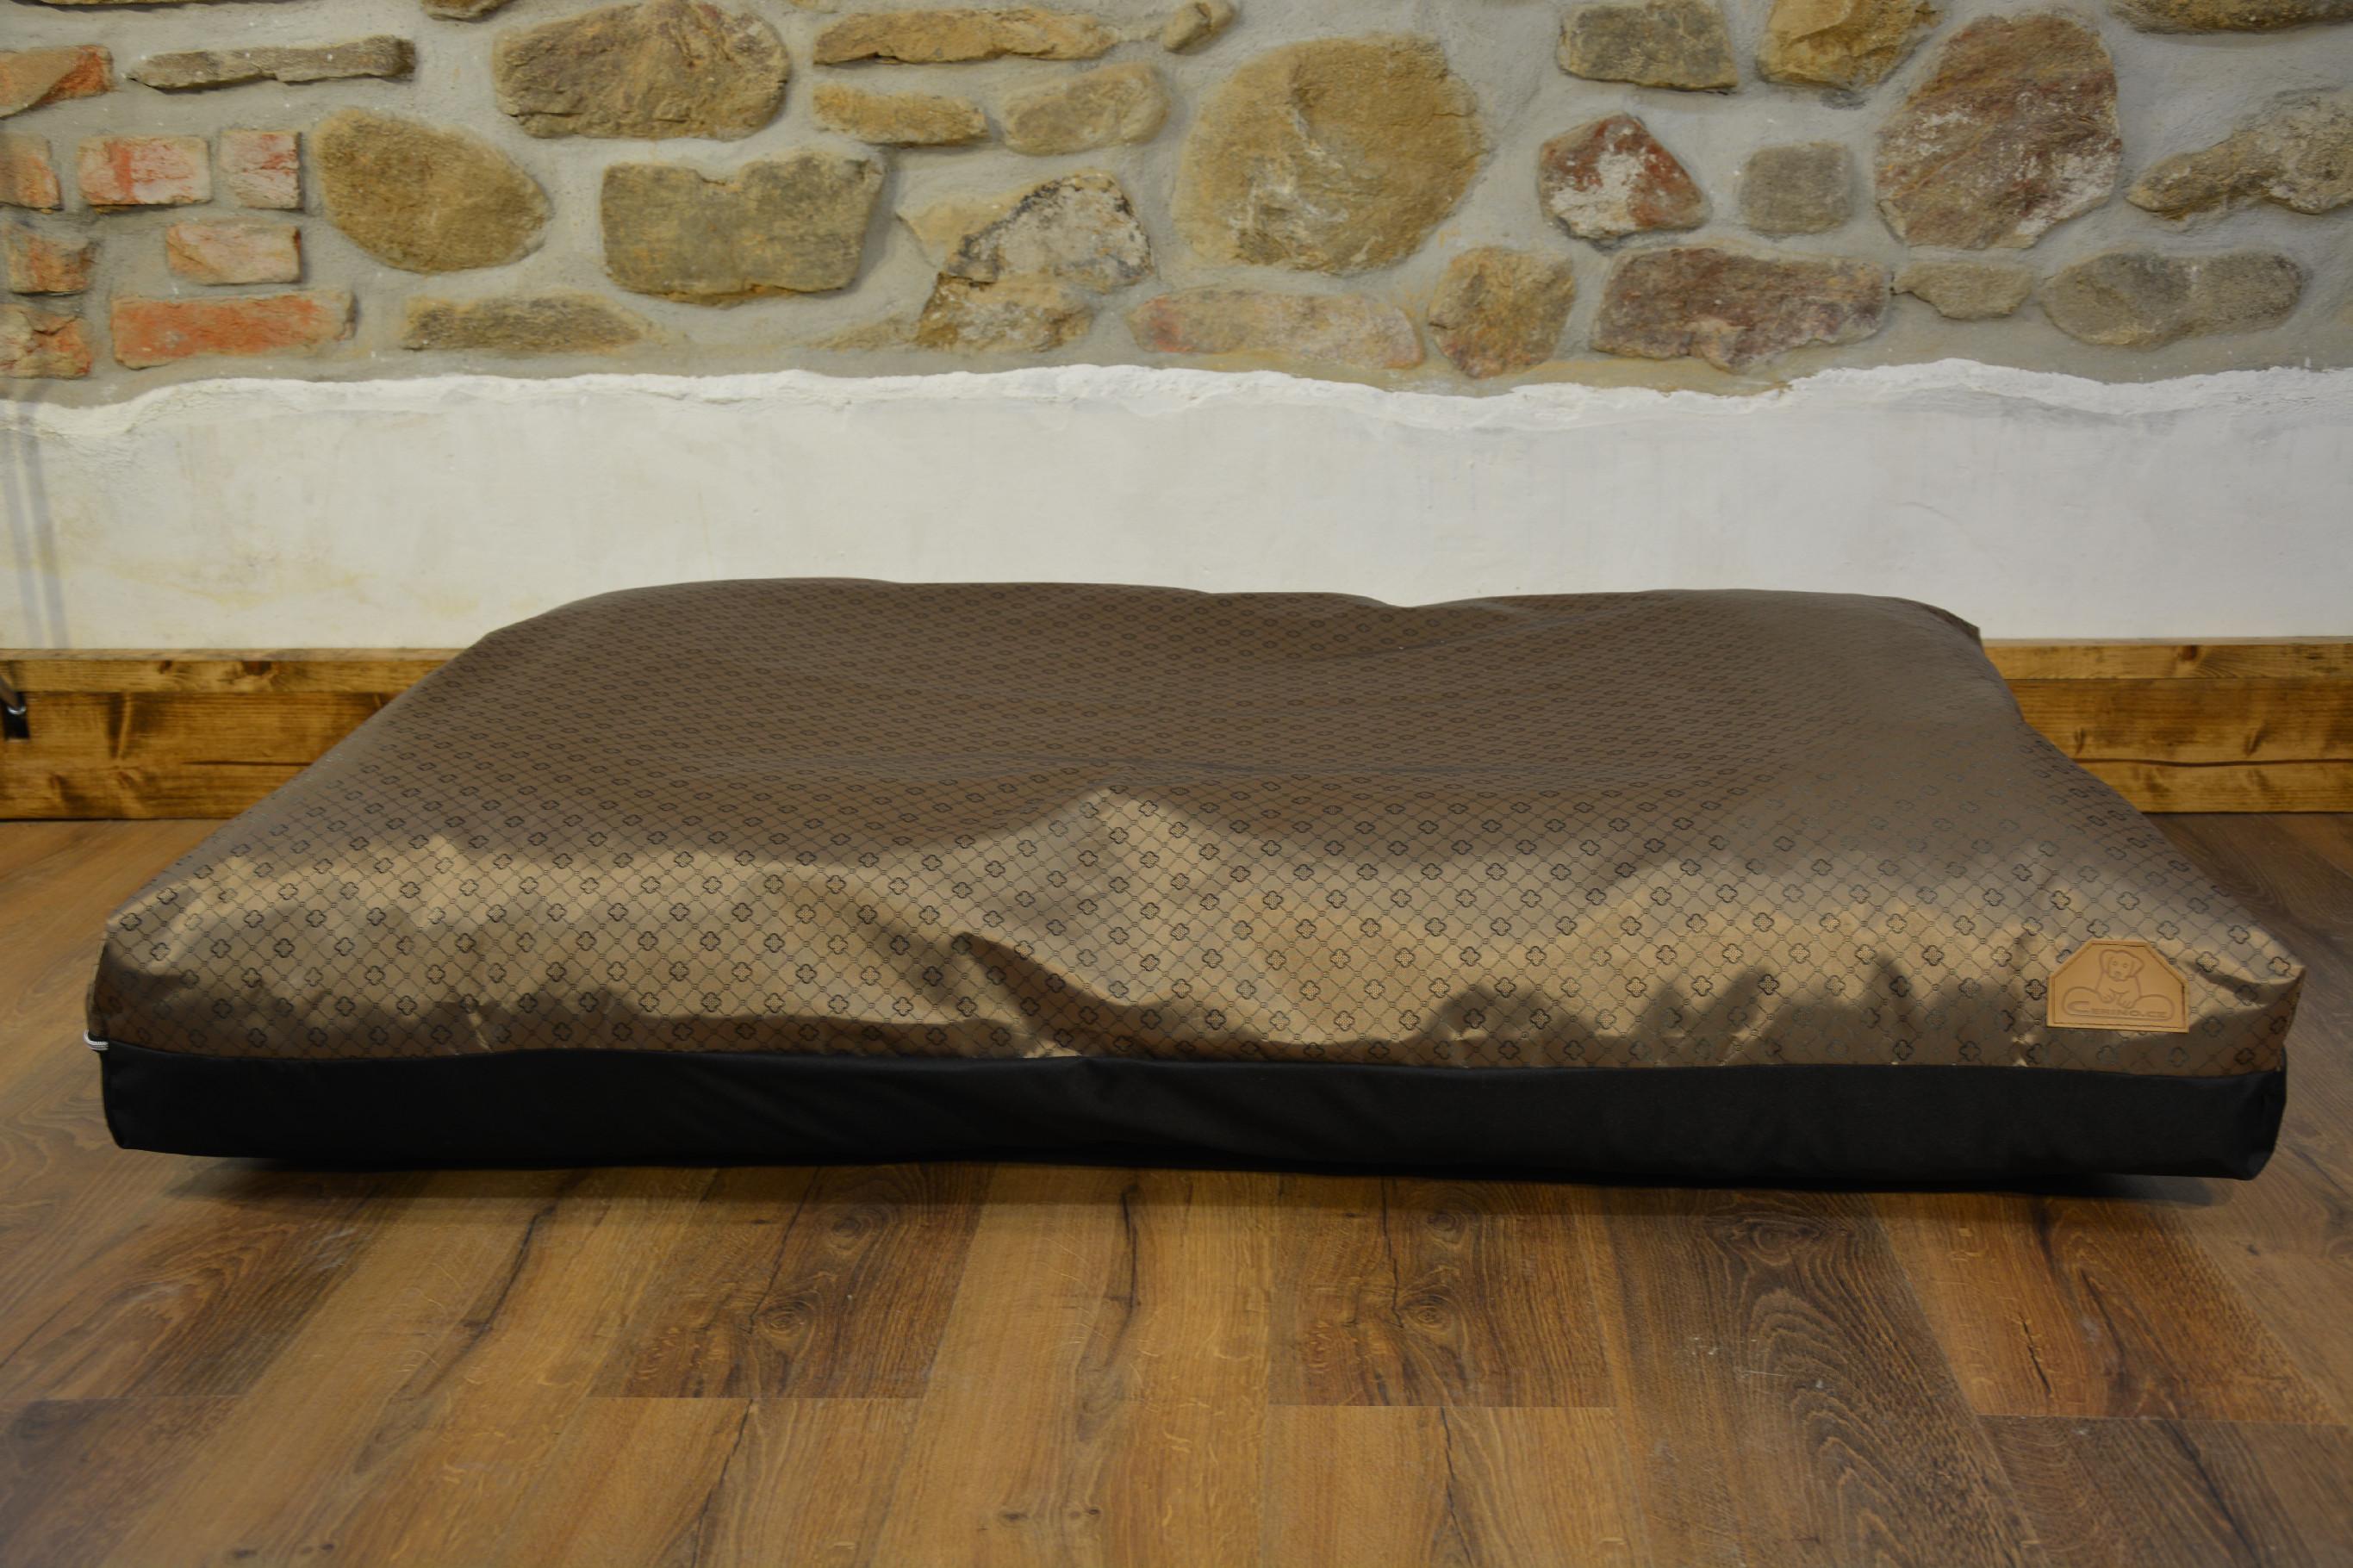 Cerino pelech Verona - CODURA tmavě hnědý 140x100x15cm